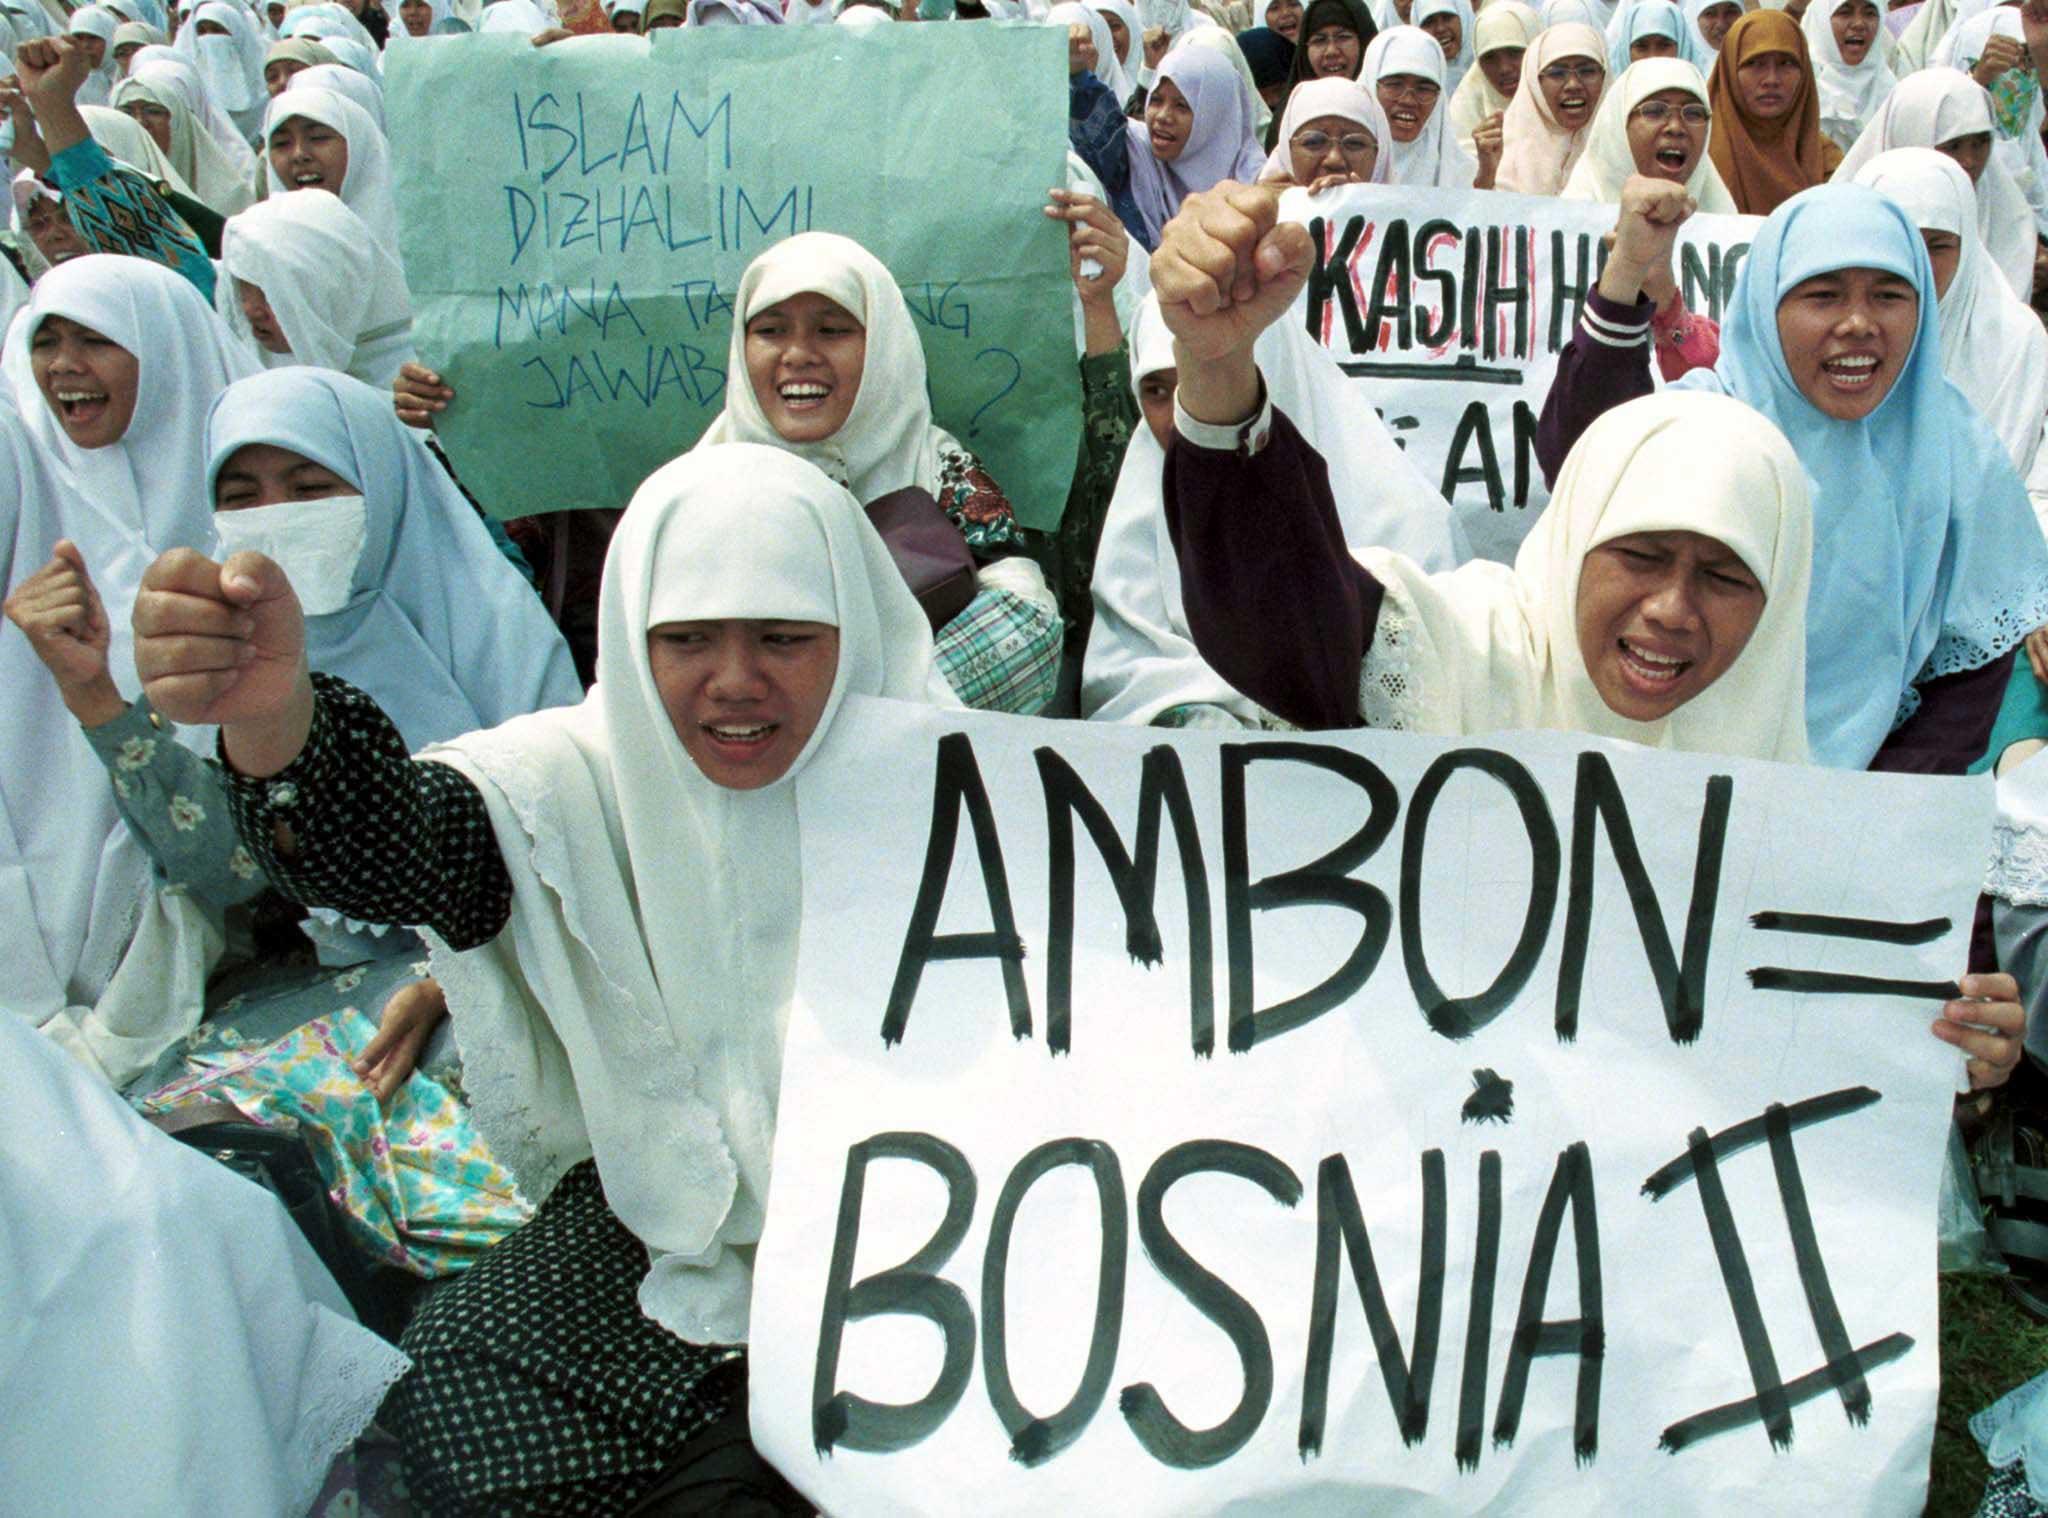 1511351032403-1999-03-05T120000Z_1654541076_RP1DRIMDFZAB_RTRMADP_3_INDONESIA-PROTEST